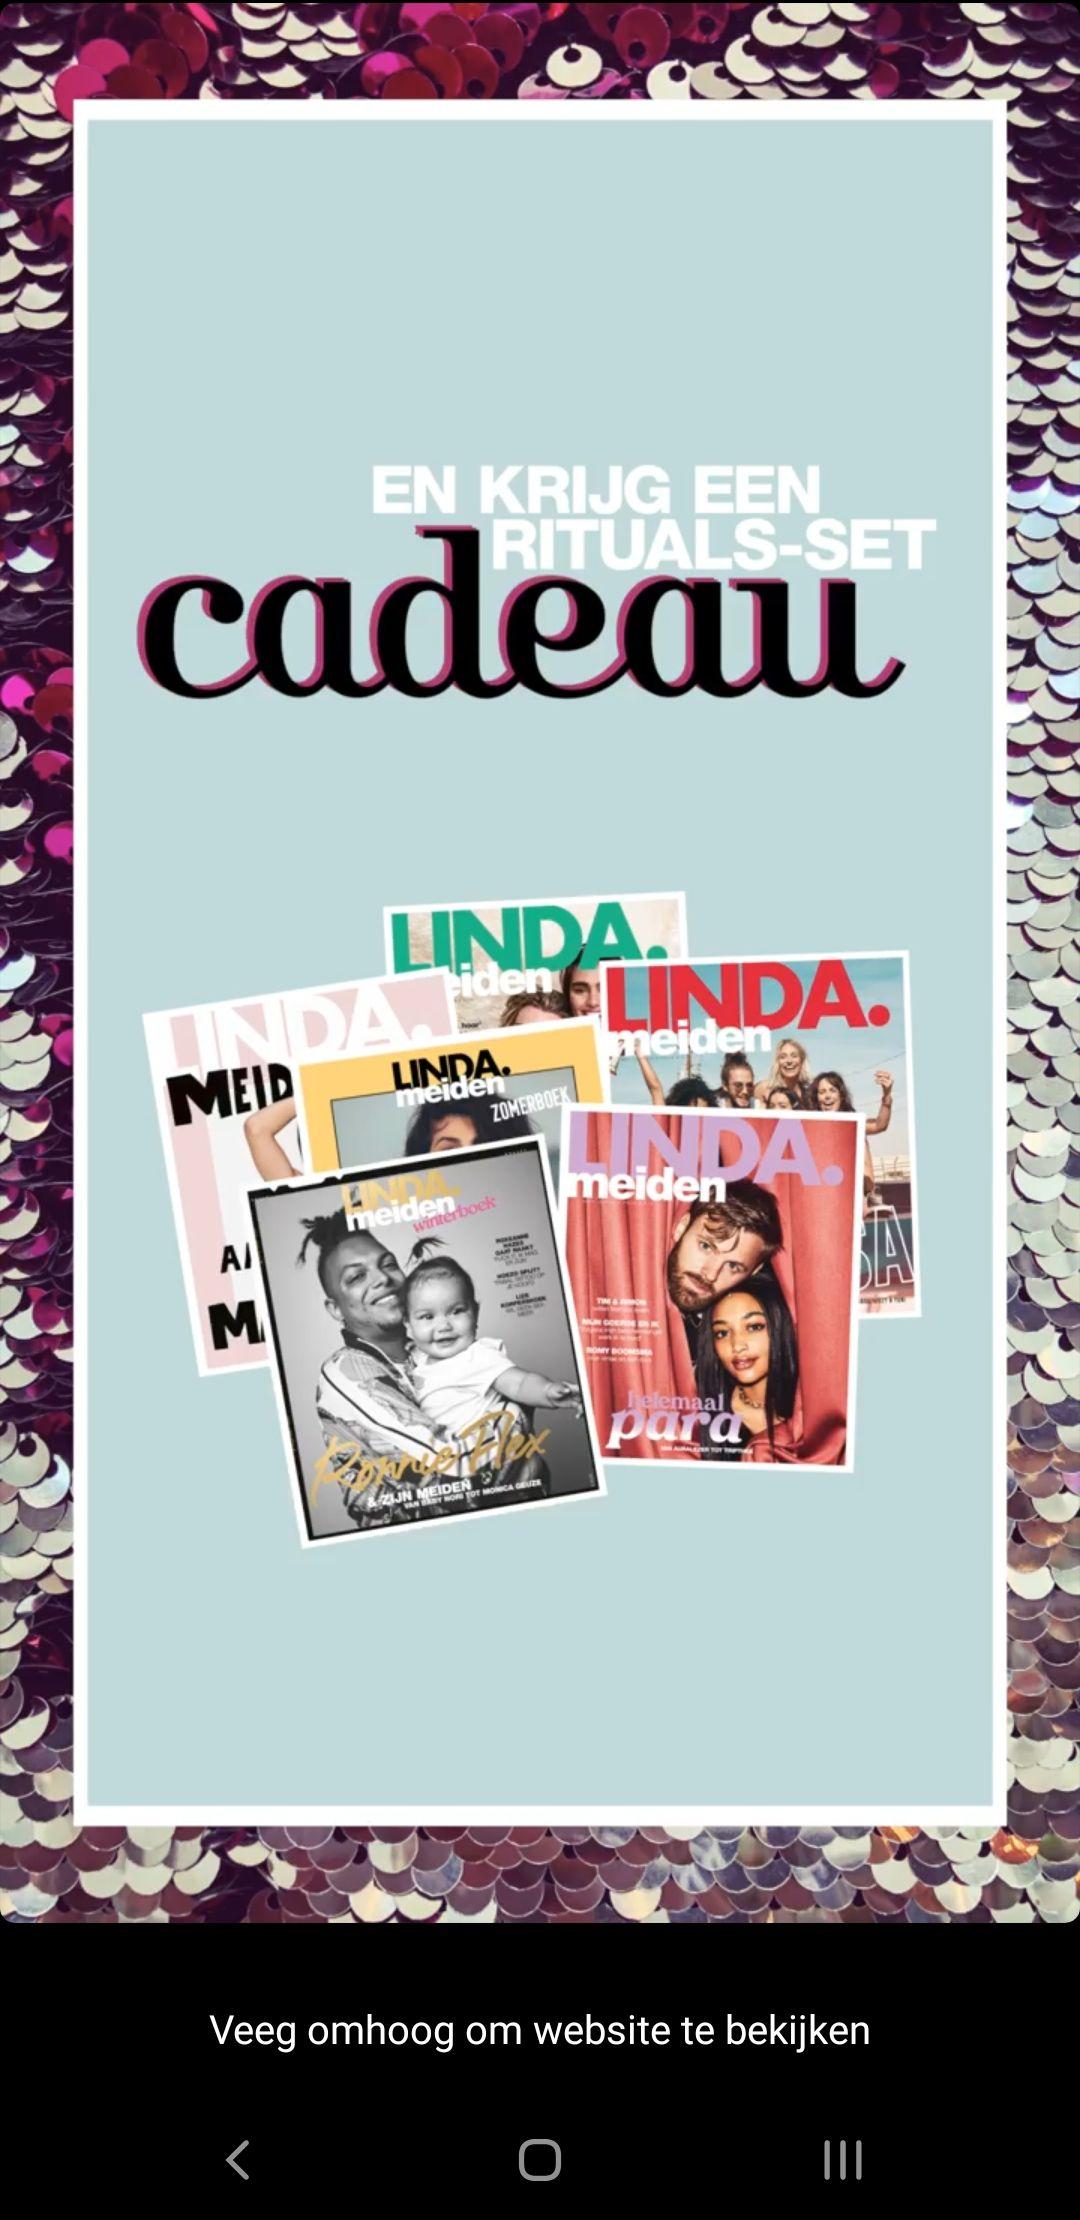 6x Linda.Meiden inclusief Ritual of Holi pakket (twv €48,10)